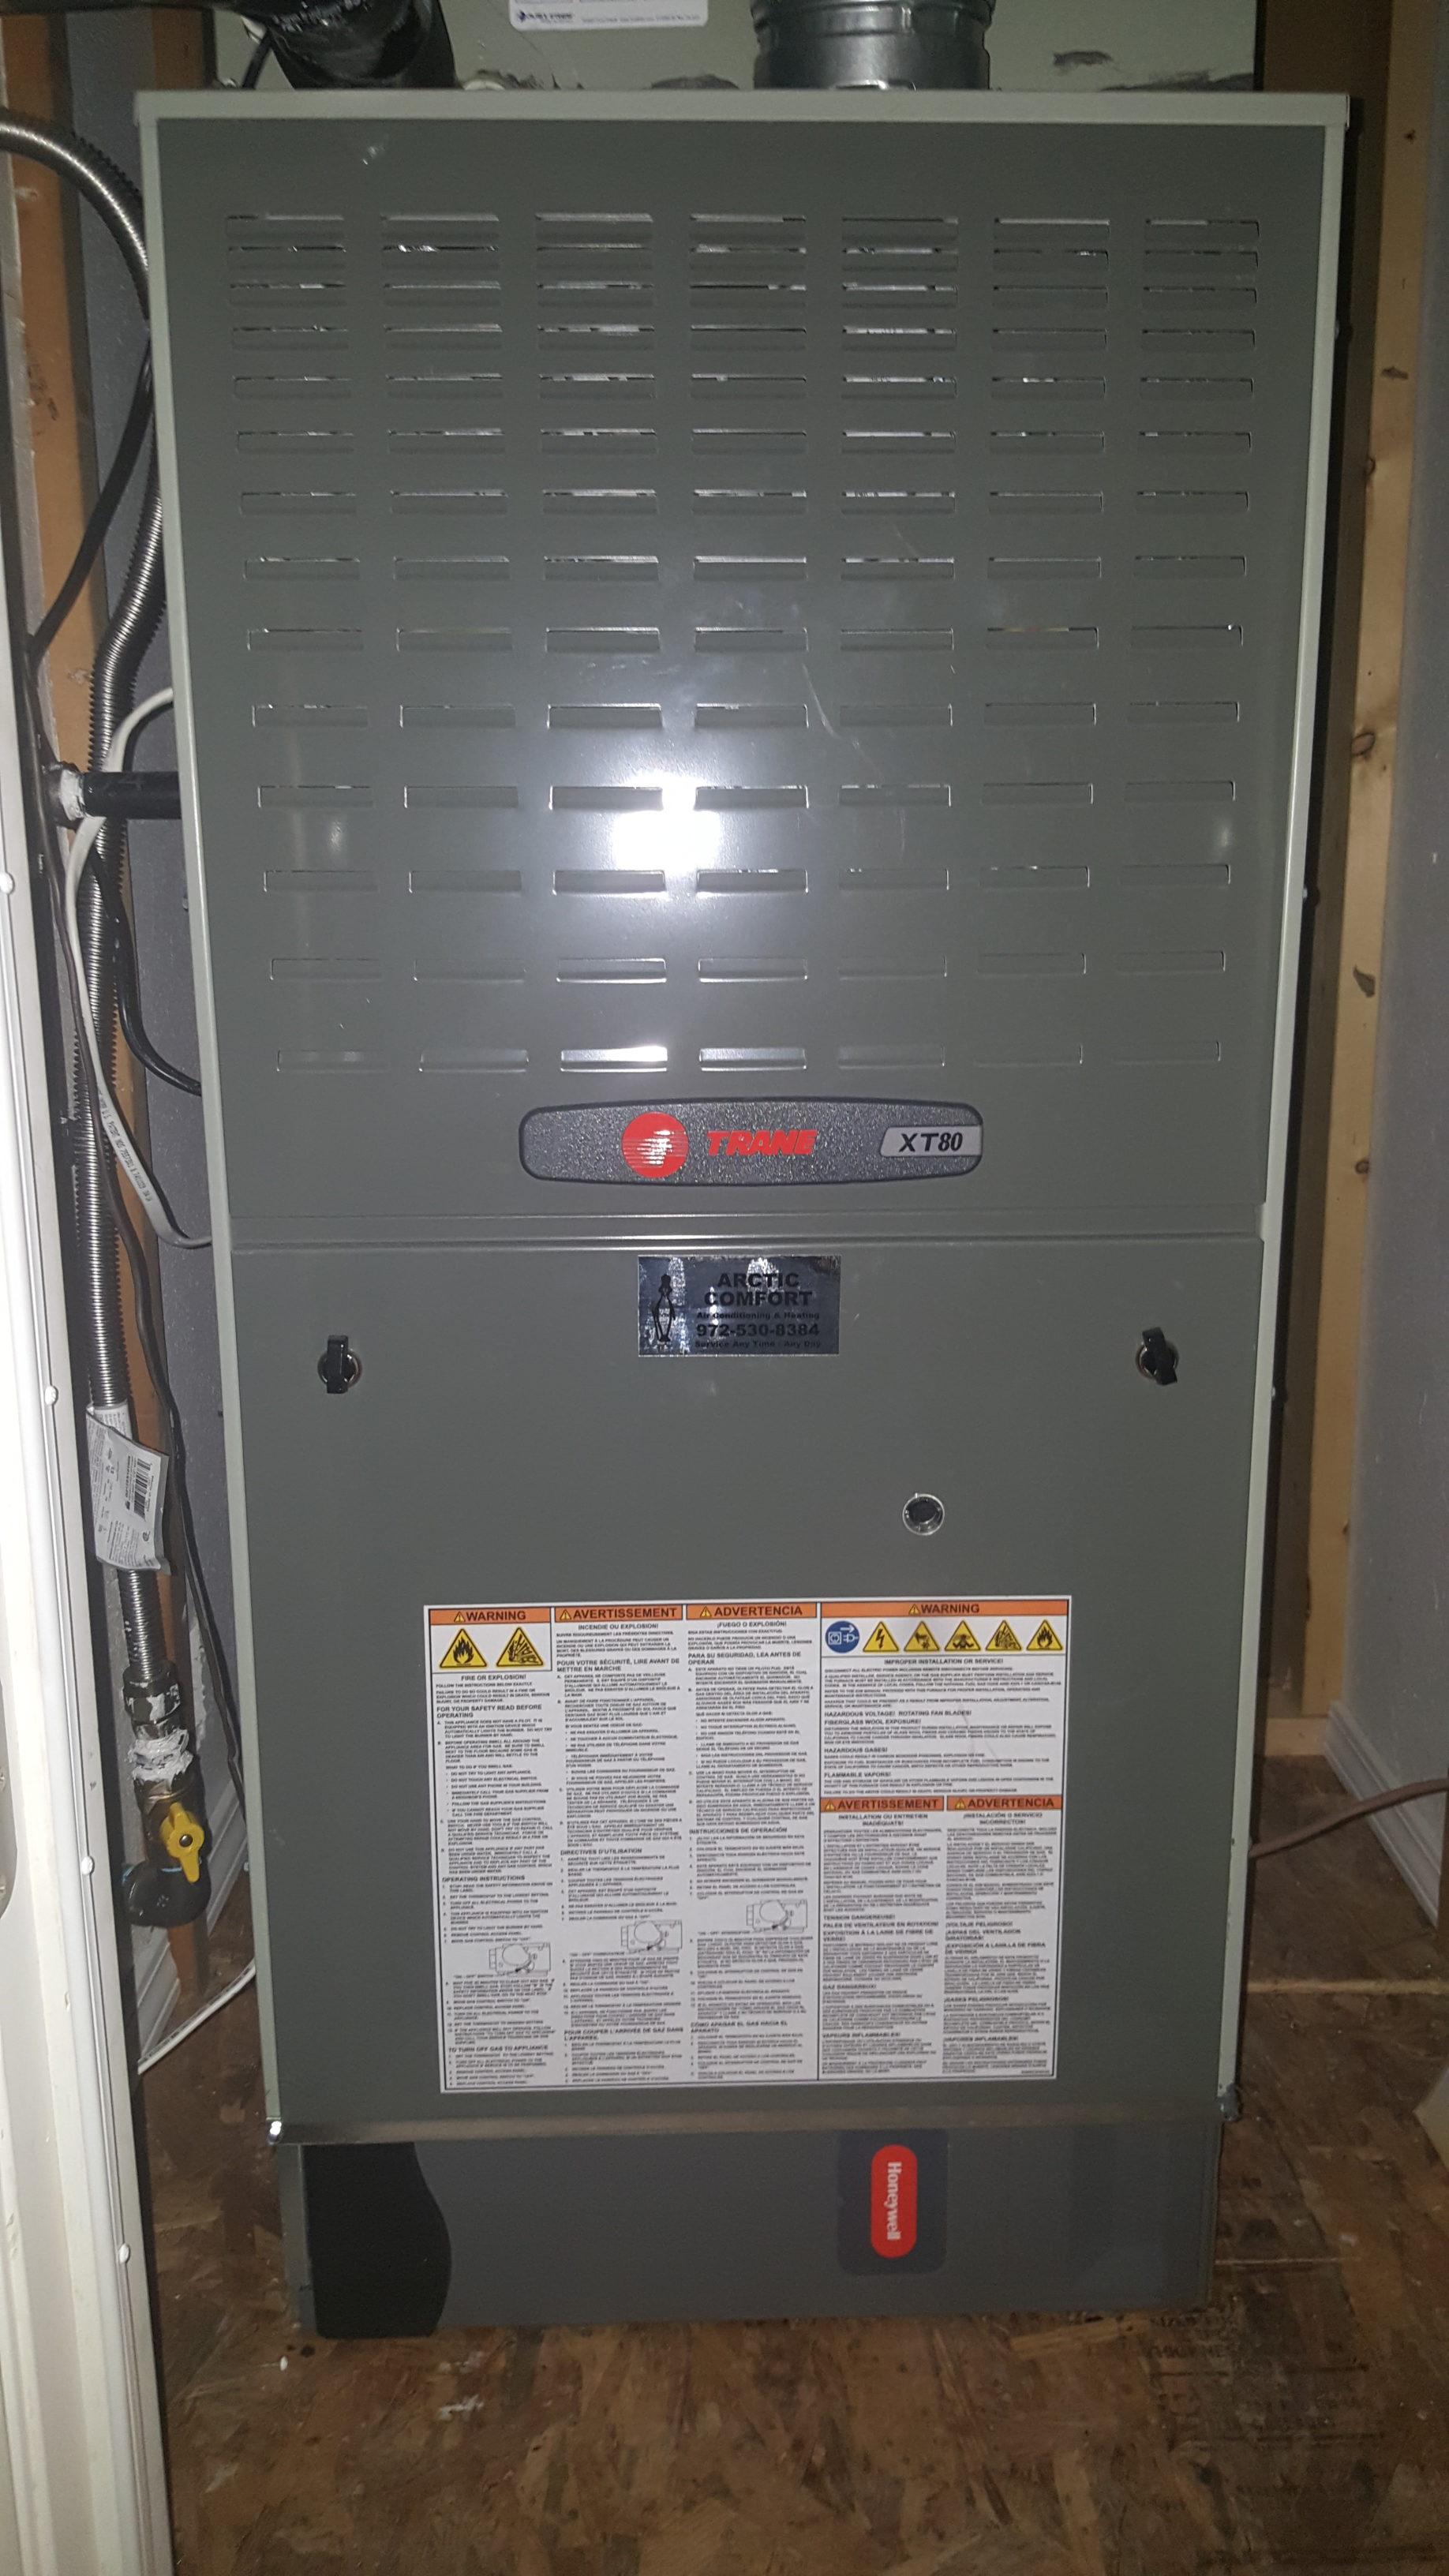 Trane XT80 Furnace and Honeywell Media Filter System